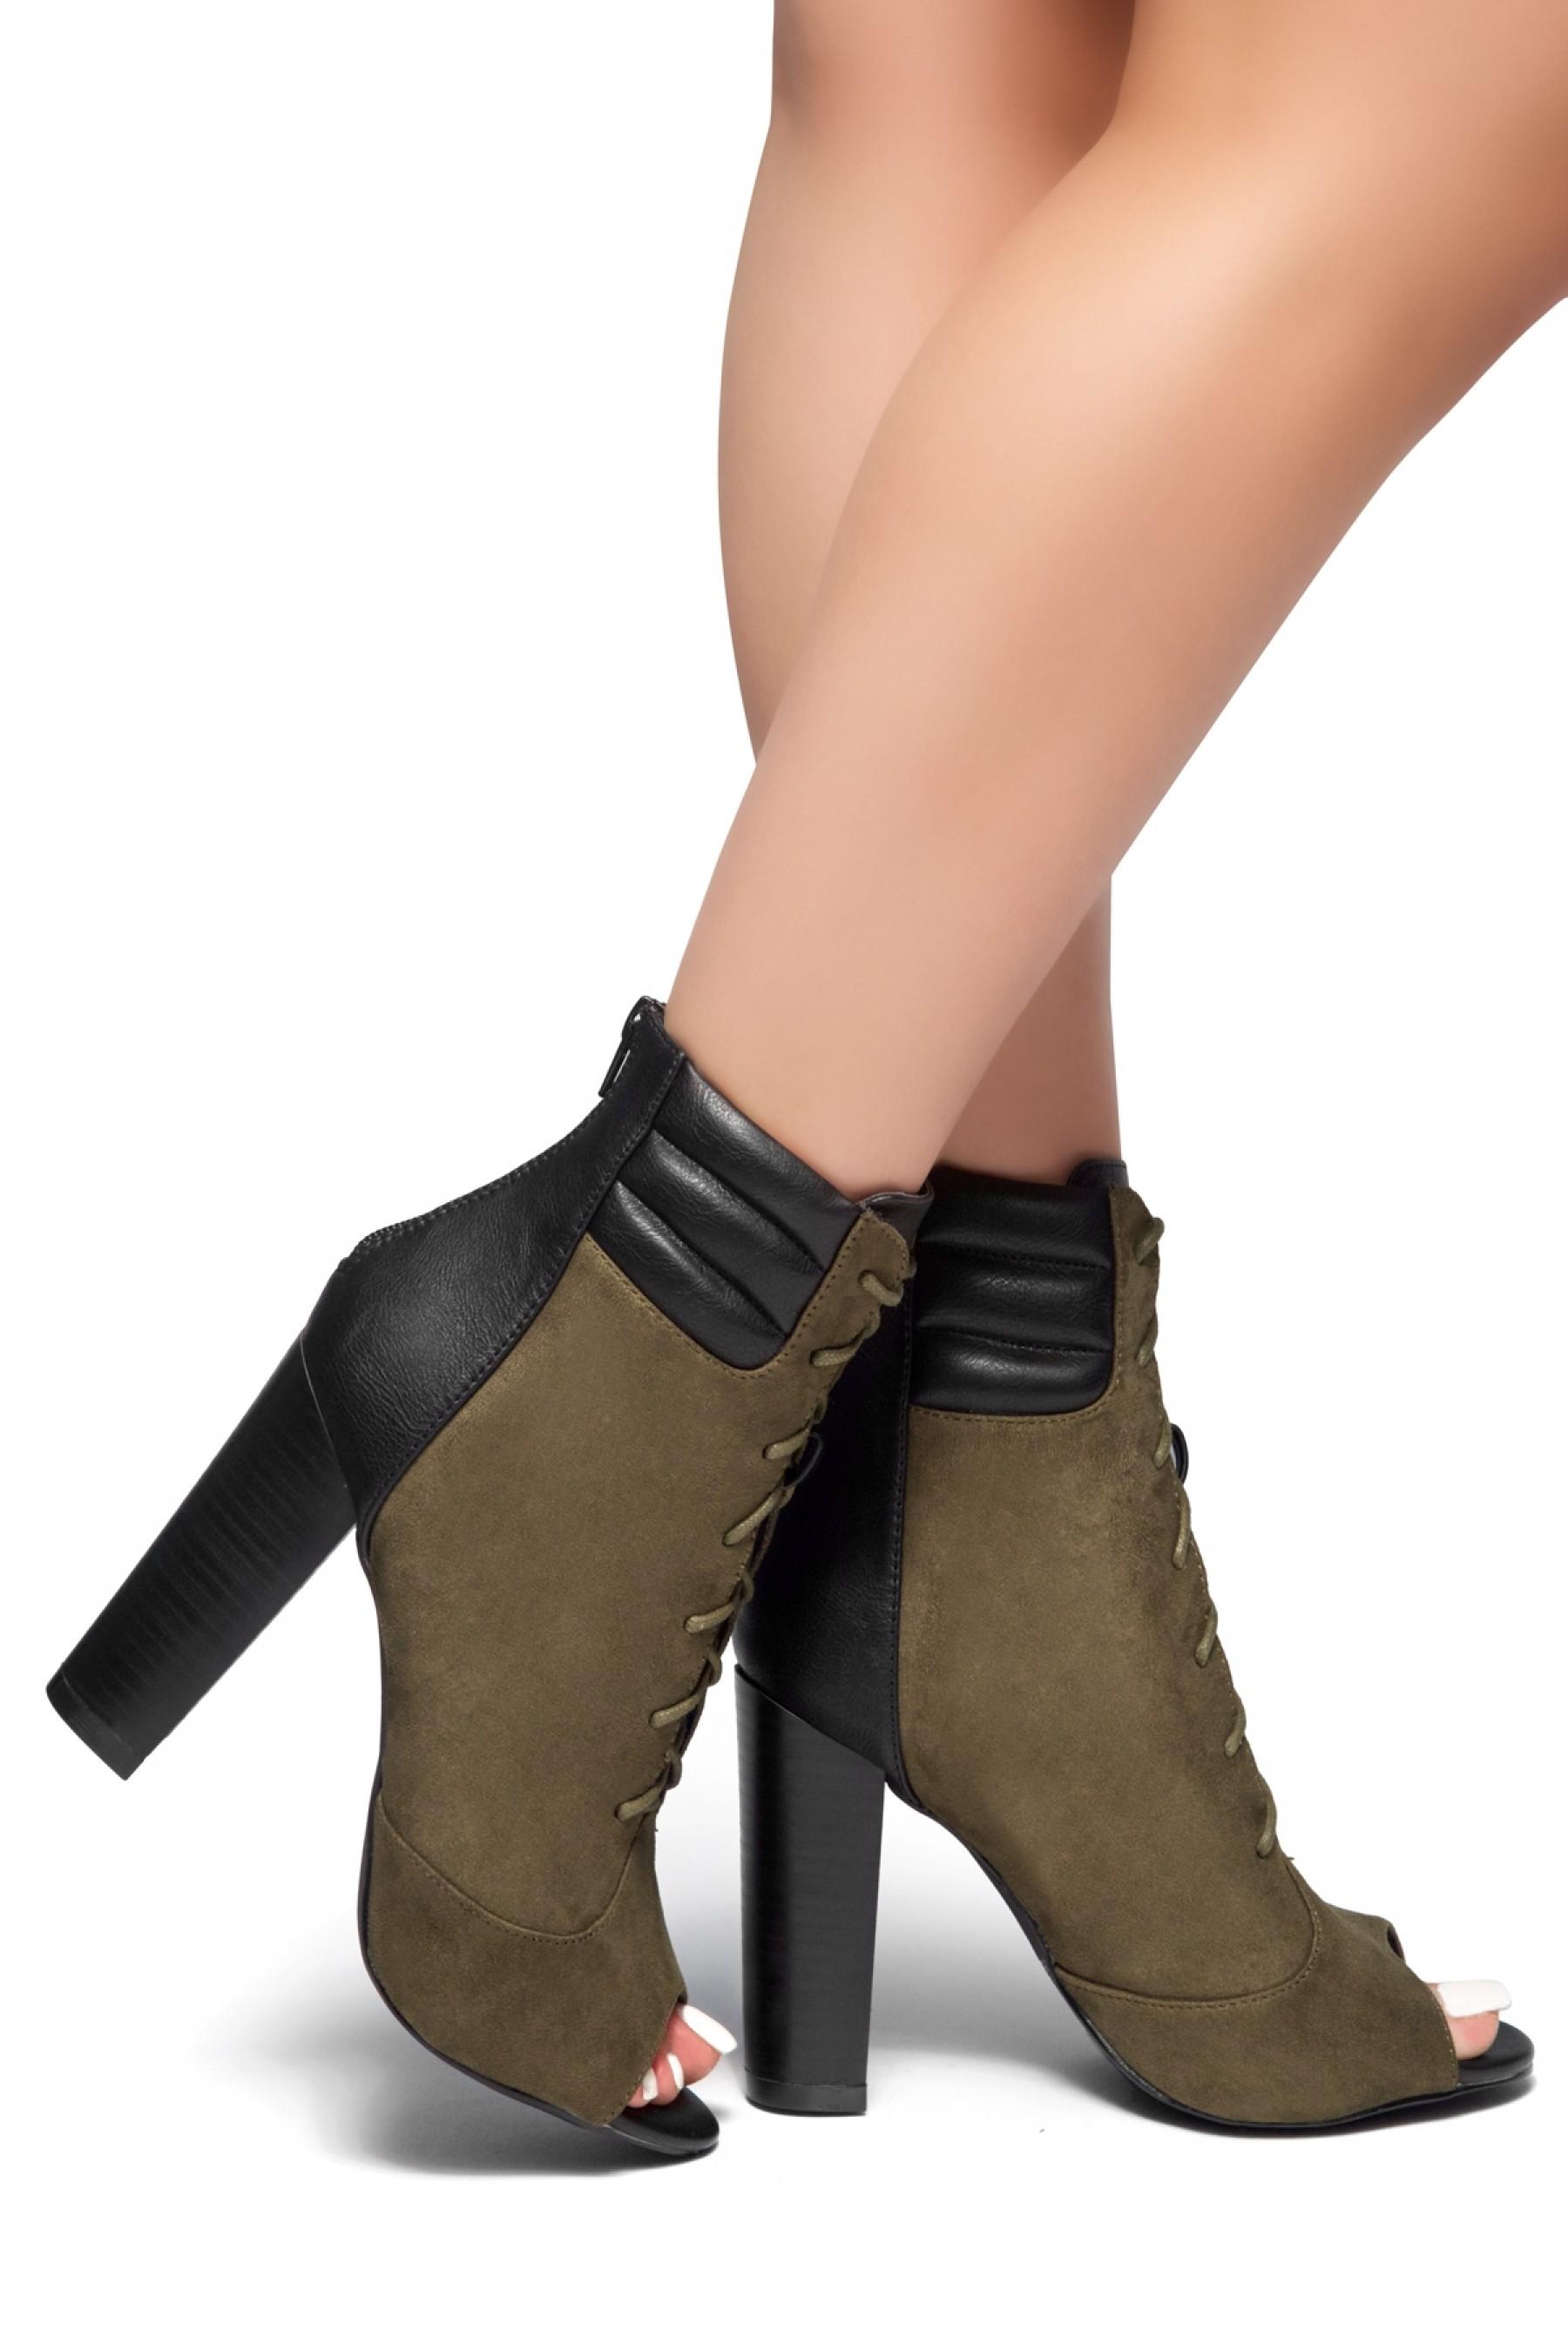 On Da Block- a peep toe, chunky heel booties (Olive)